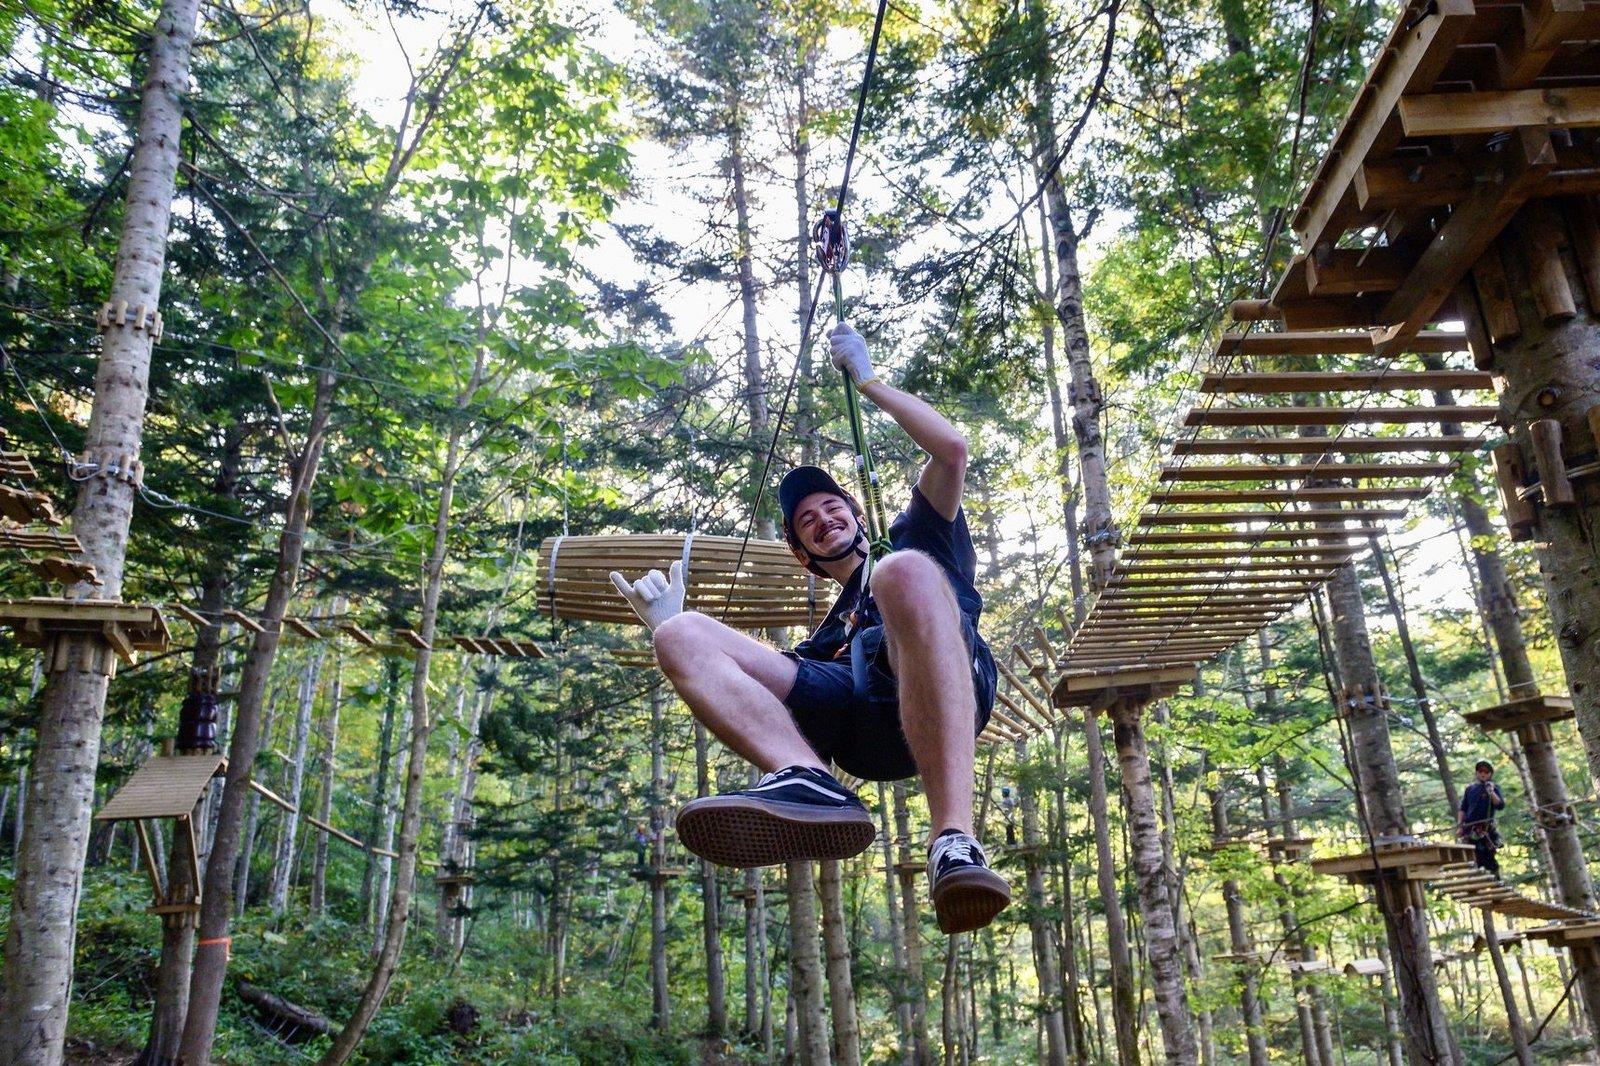 A manl having fun on zipline in Niseko Hanazono resort